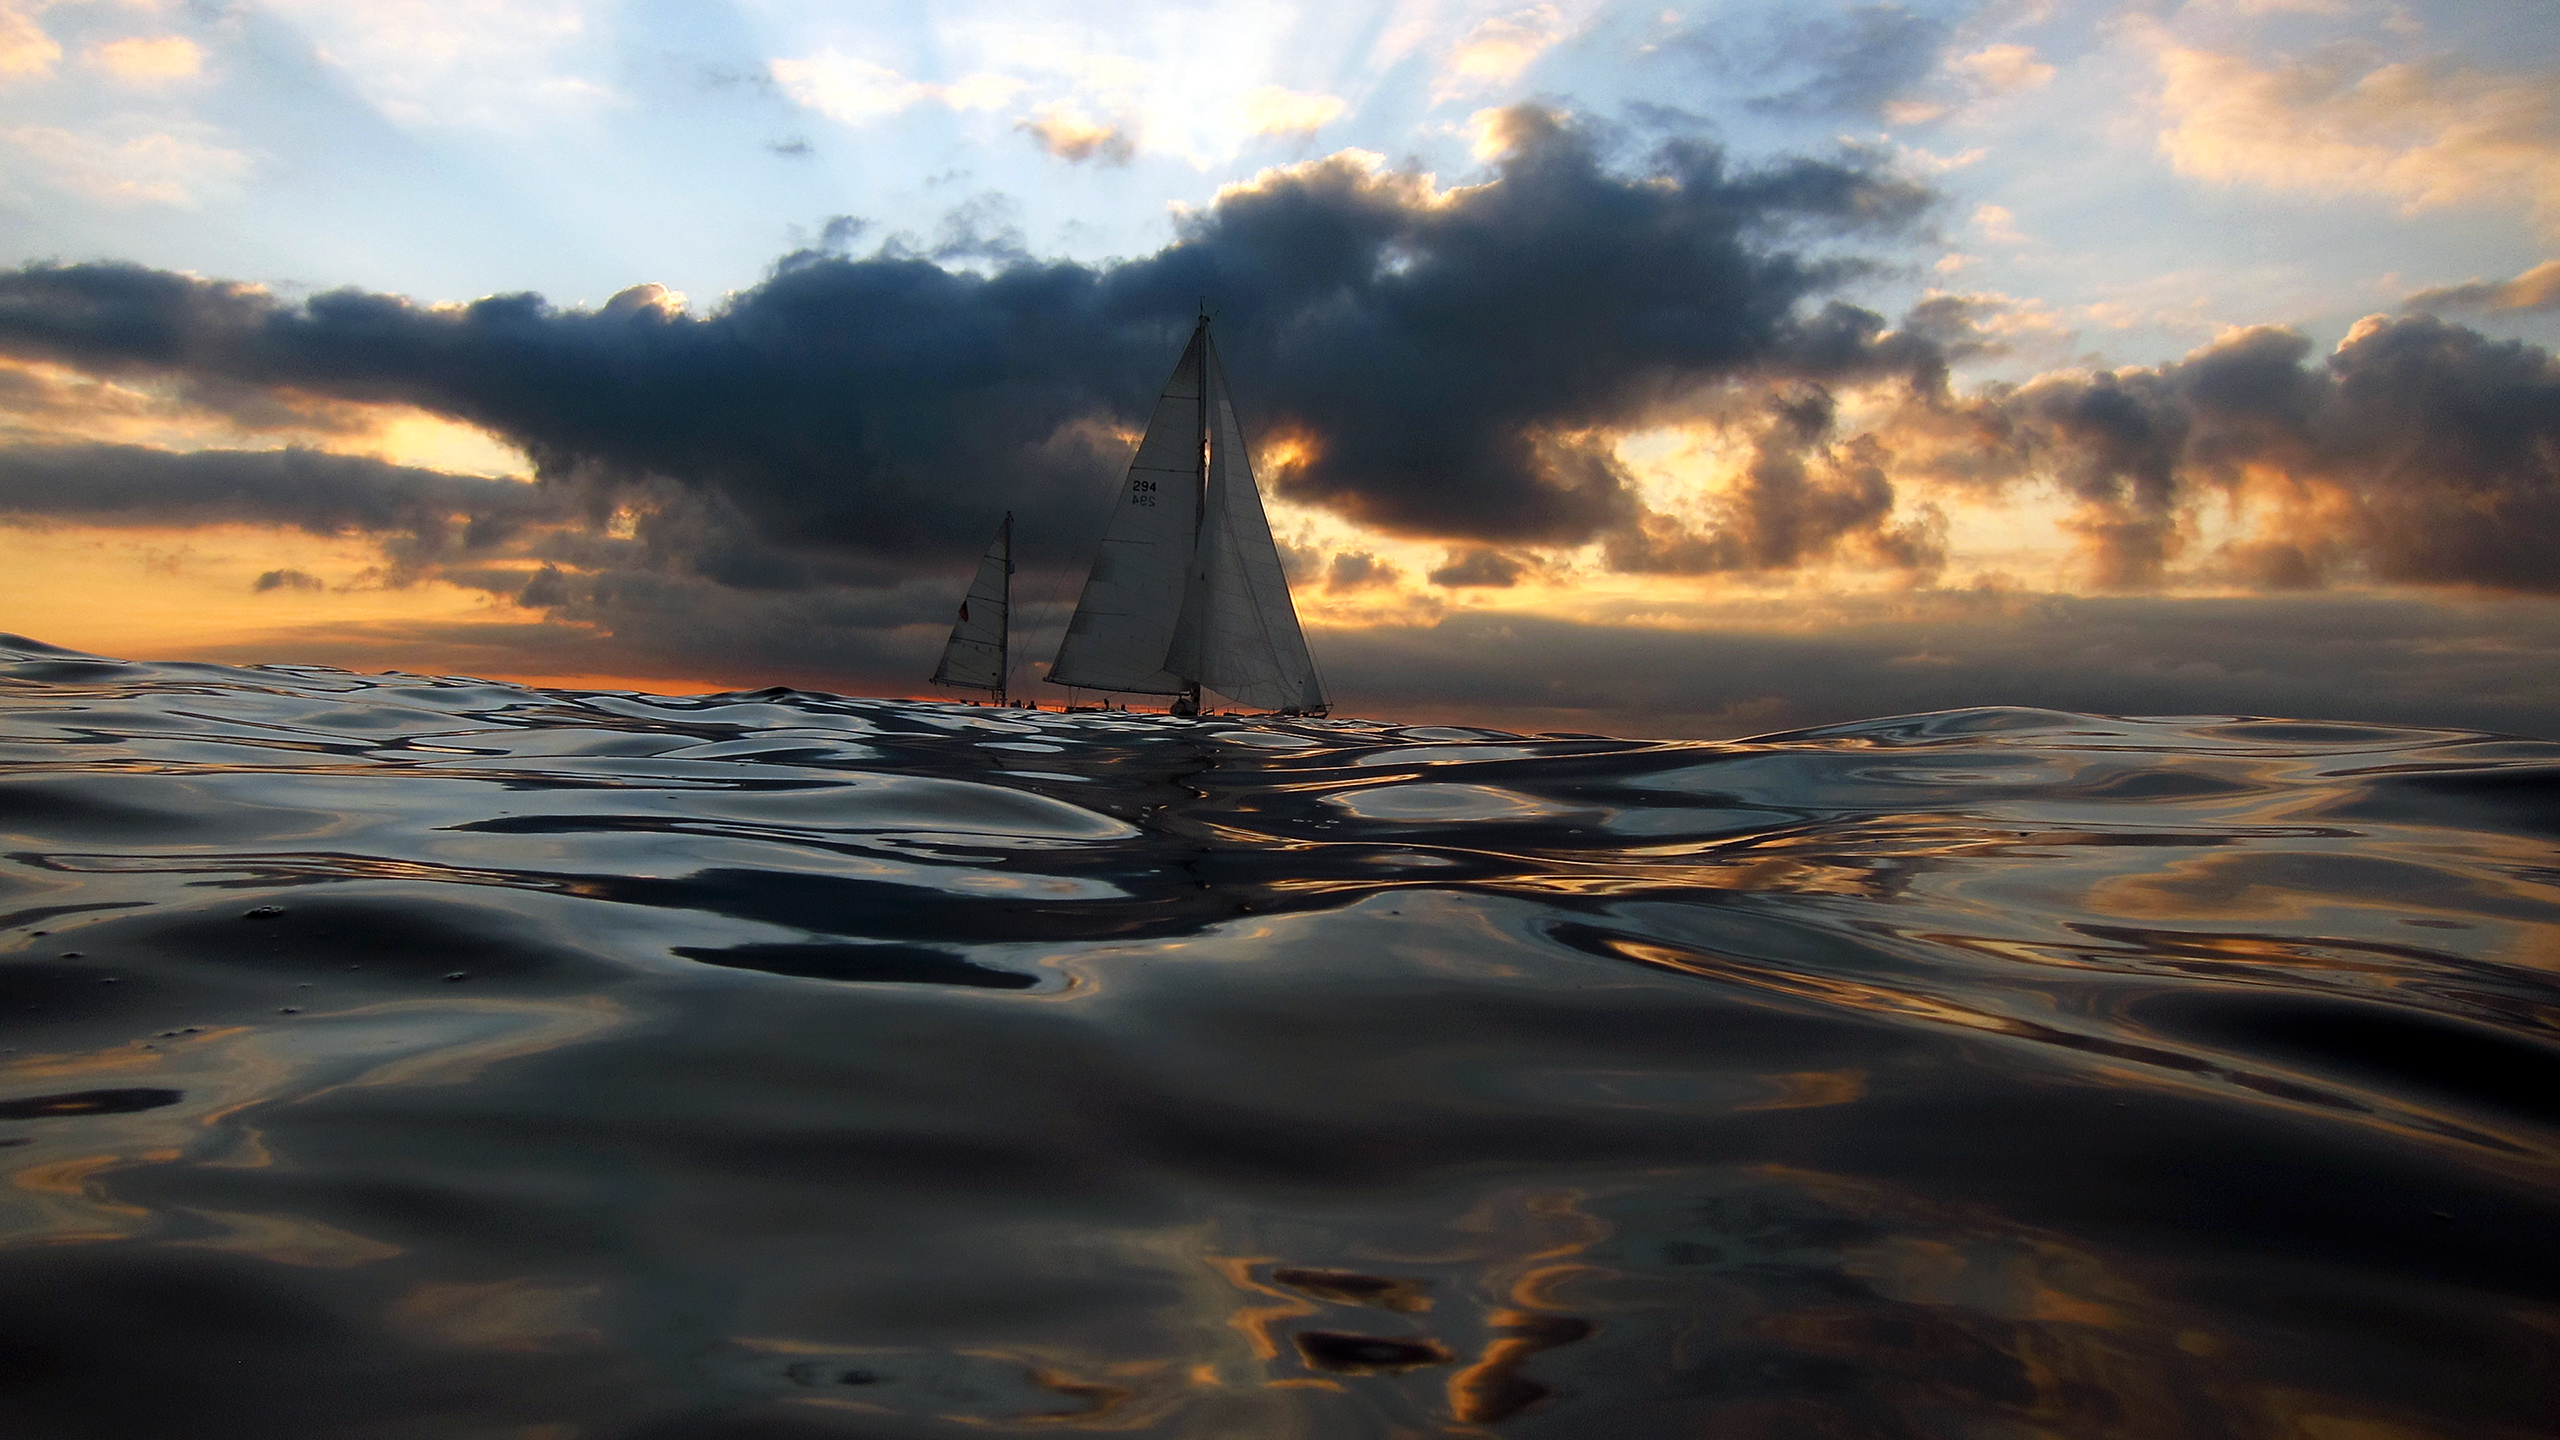 impala_sailing_french_riviera